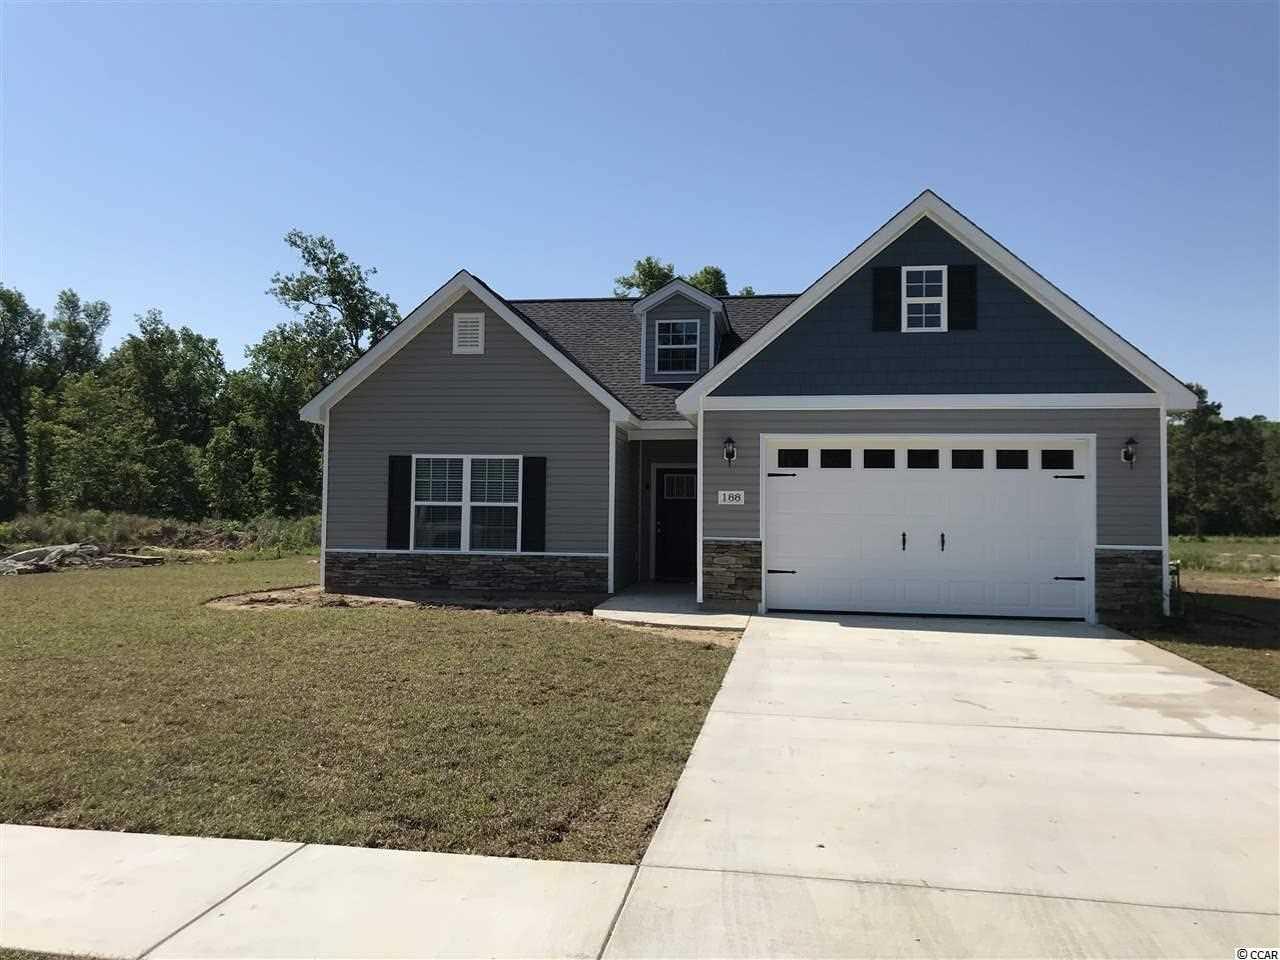 188 Springtide Drive Conway, SC 29527 | MLS 1725318 Photo 1